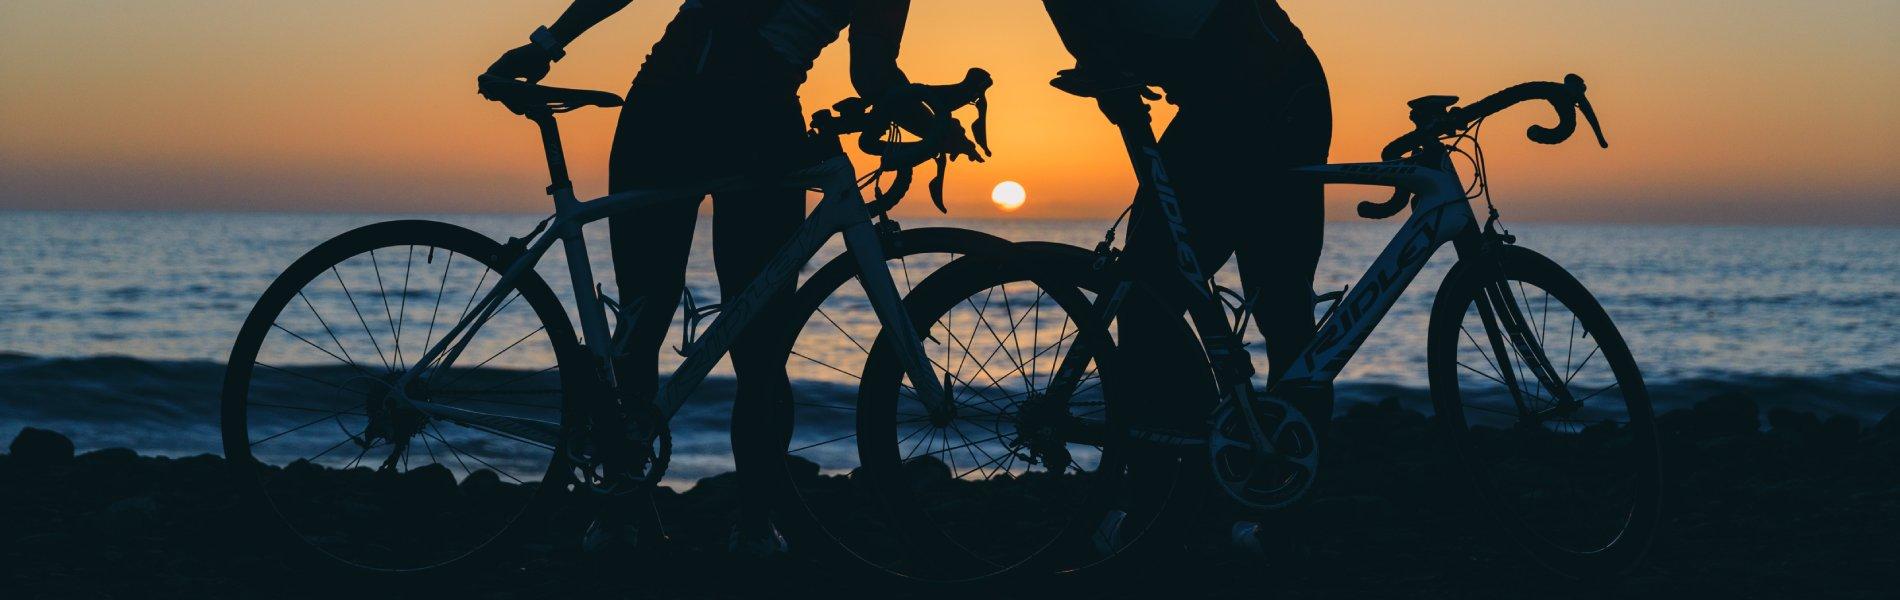 Fahrrad-freundlich